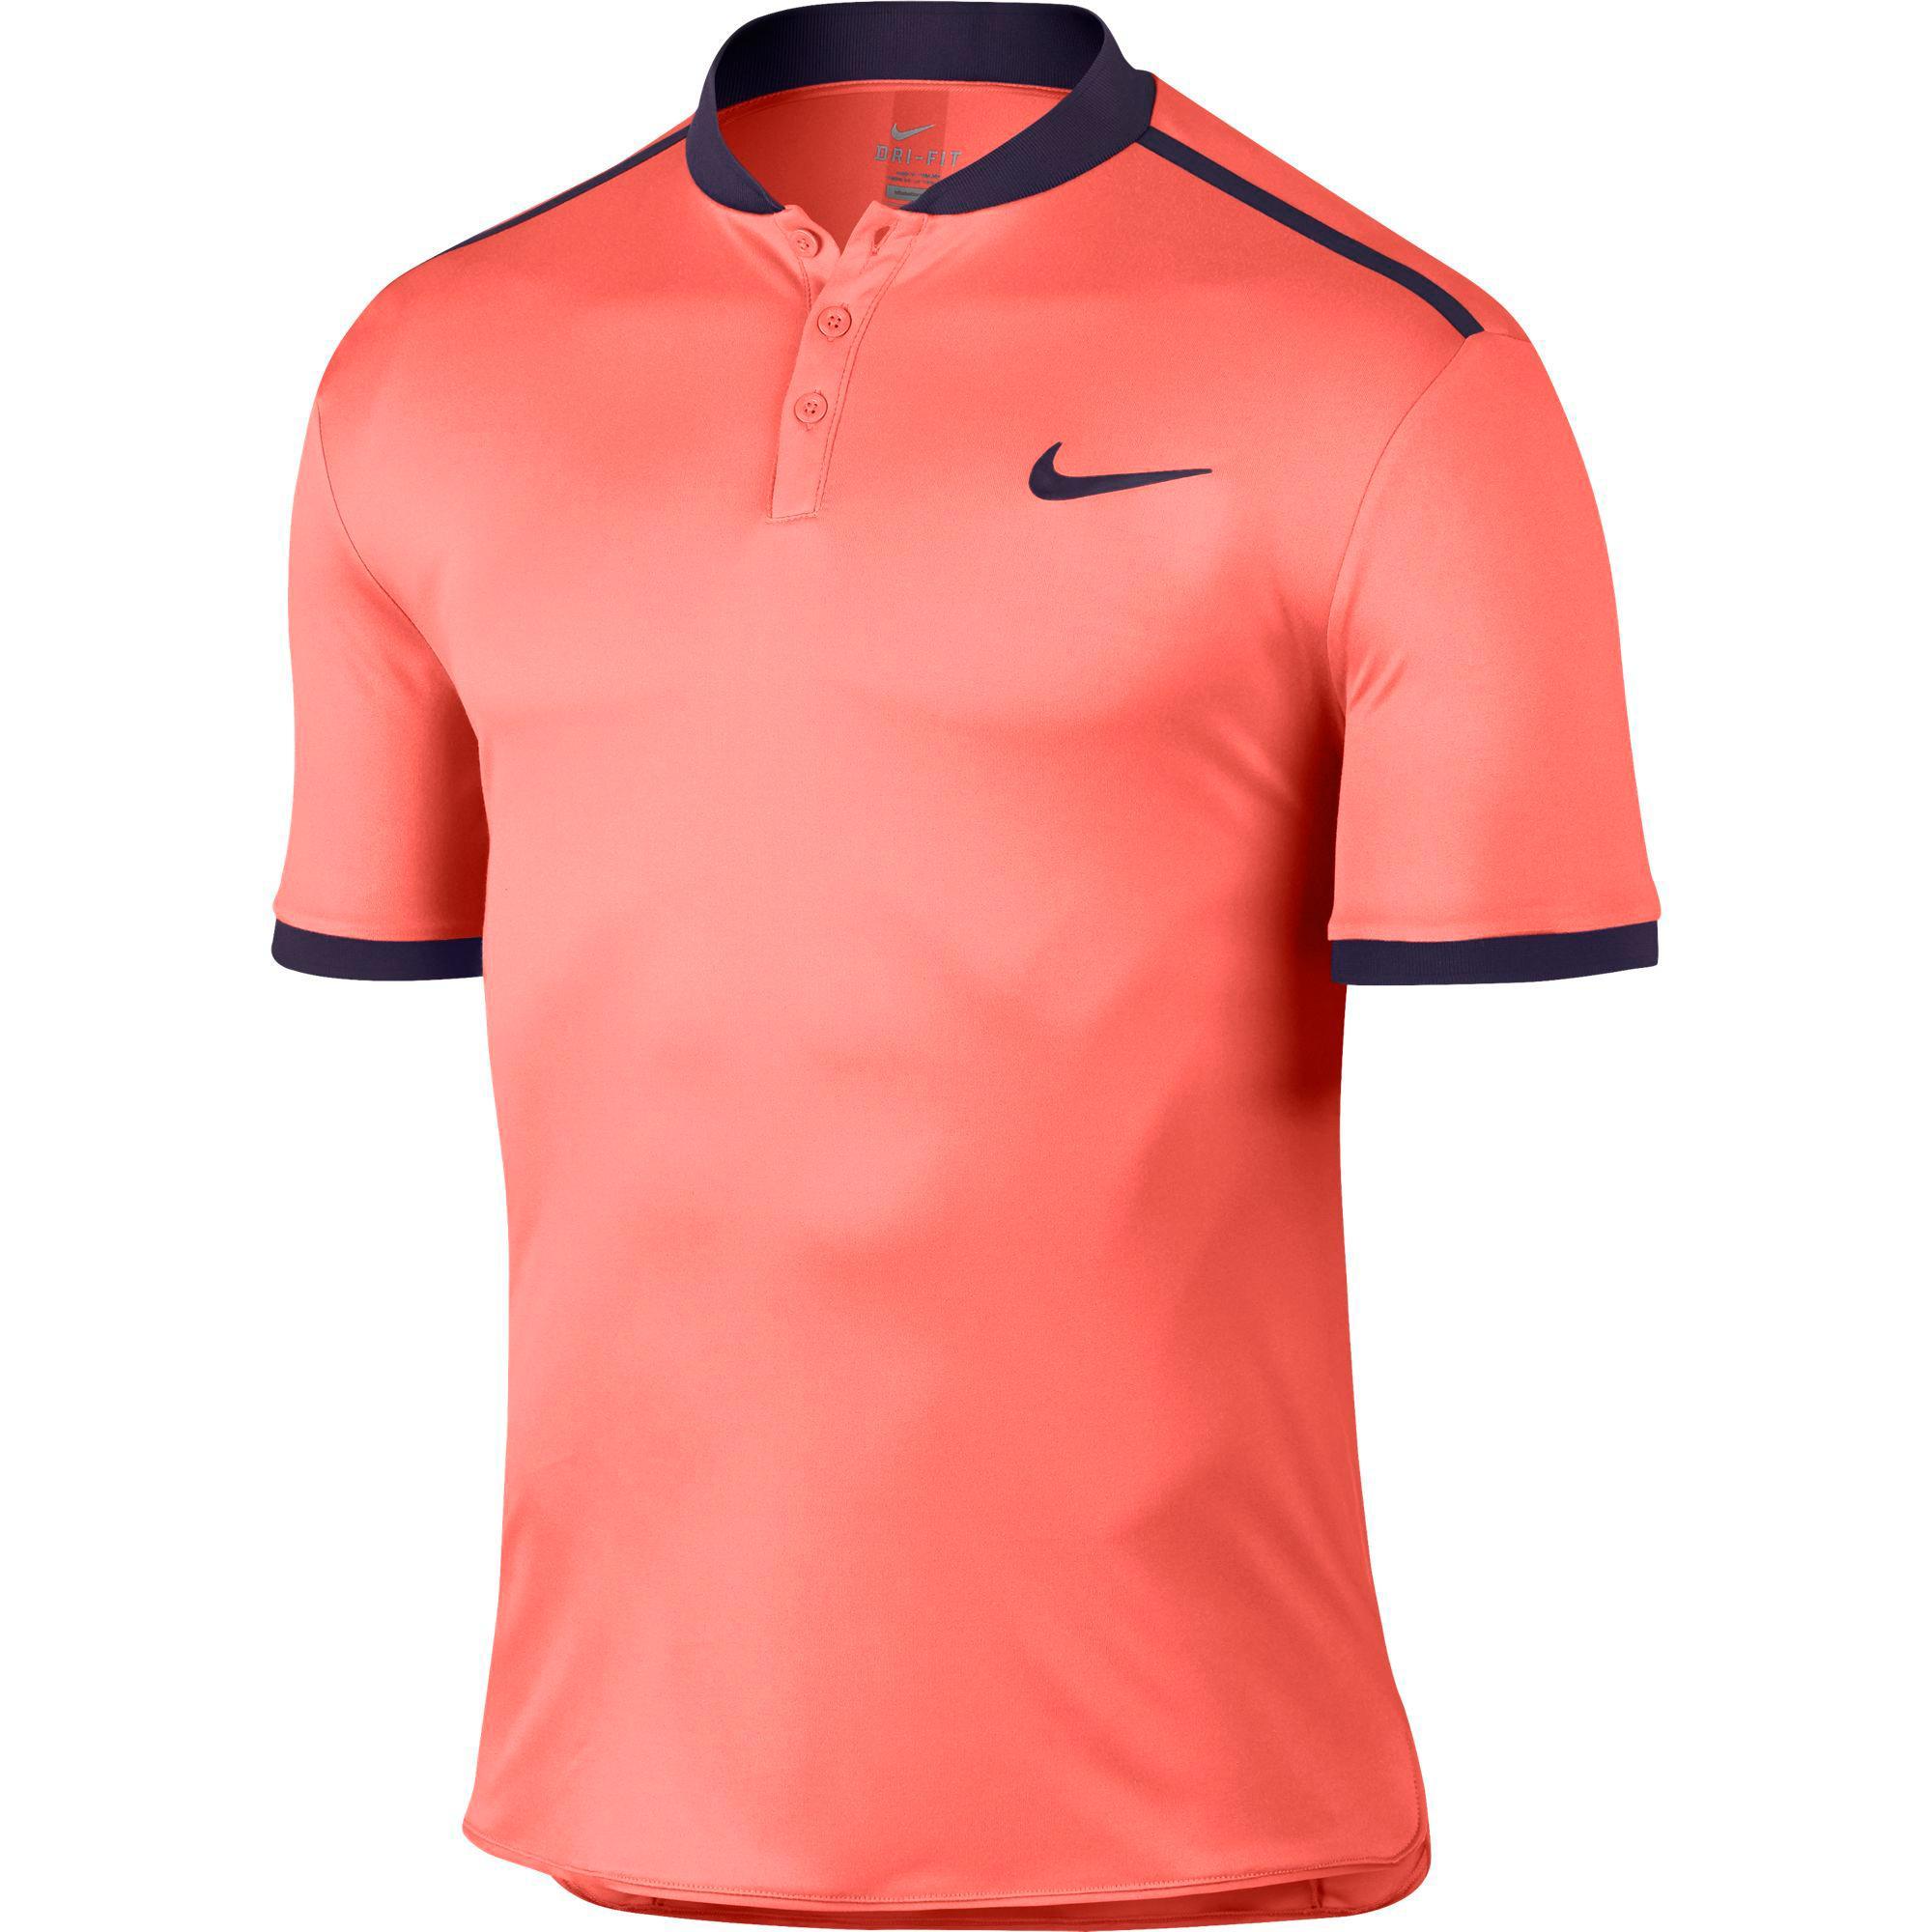 Nike Mens Advantage Premier Polo - Bright Mango/Purple